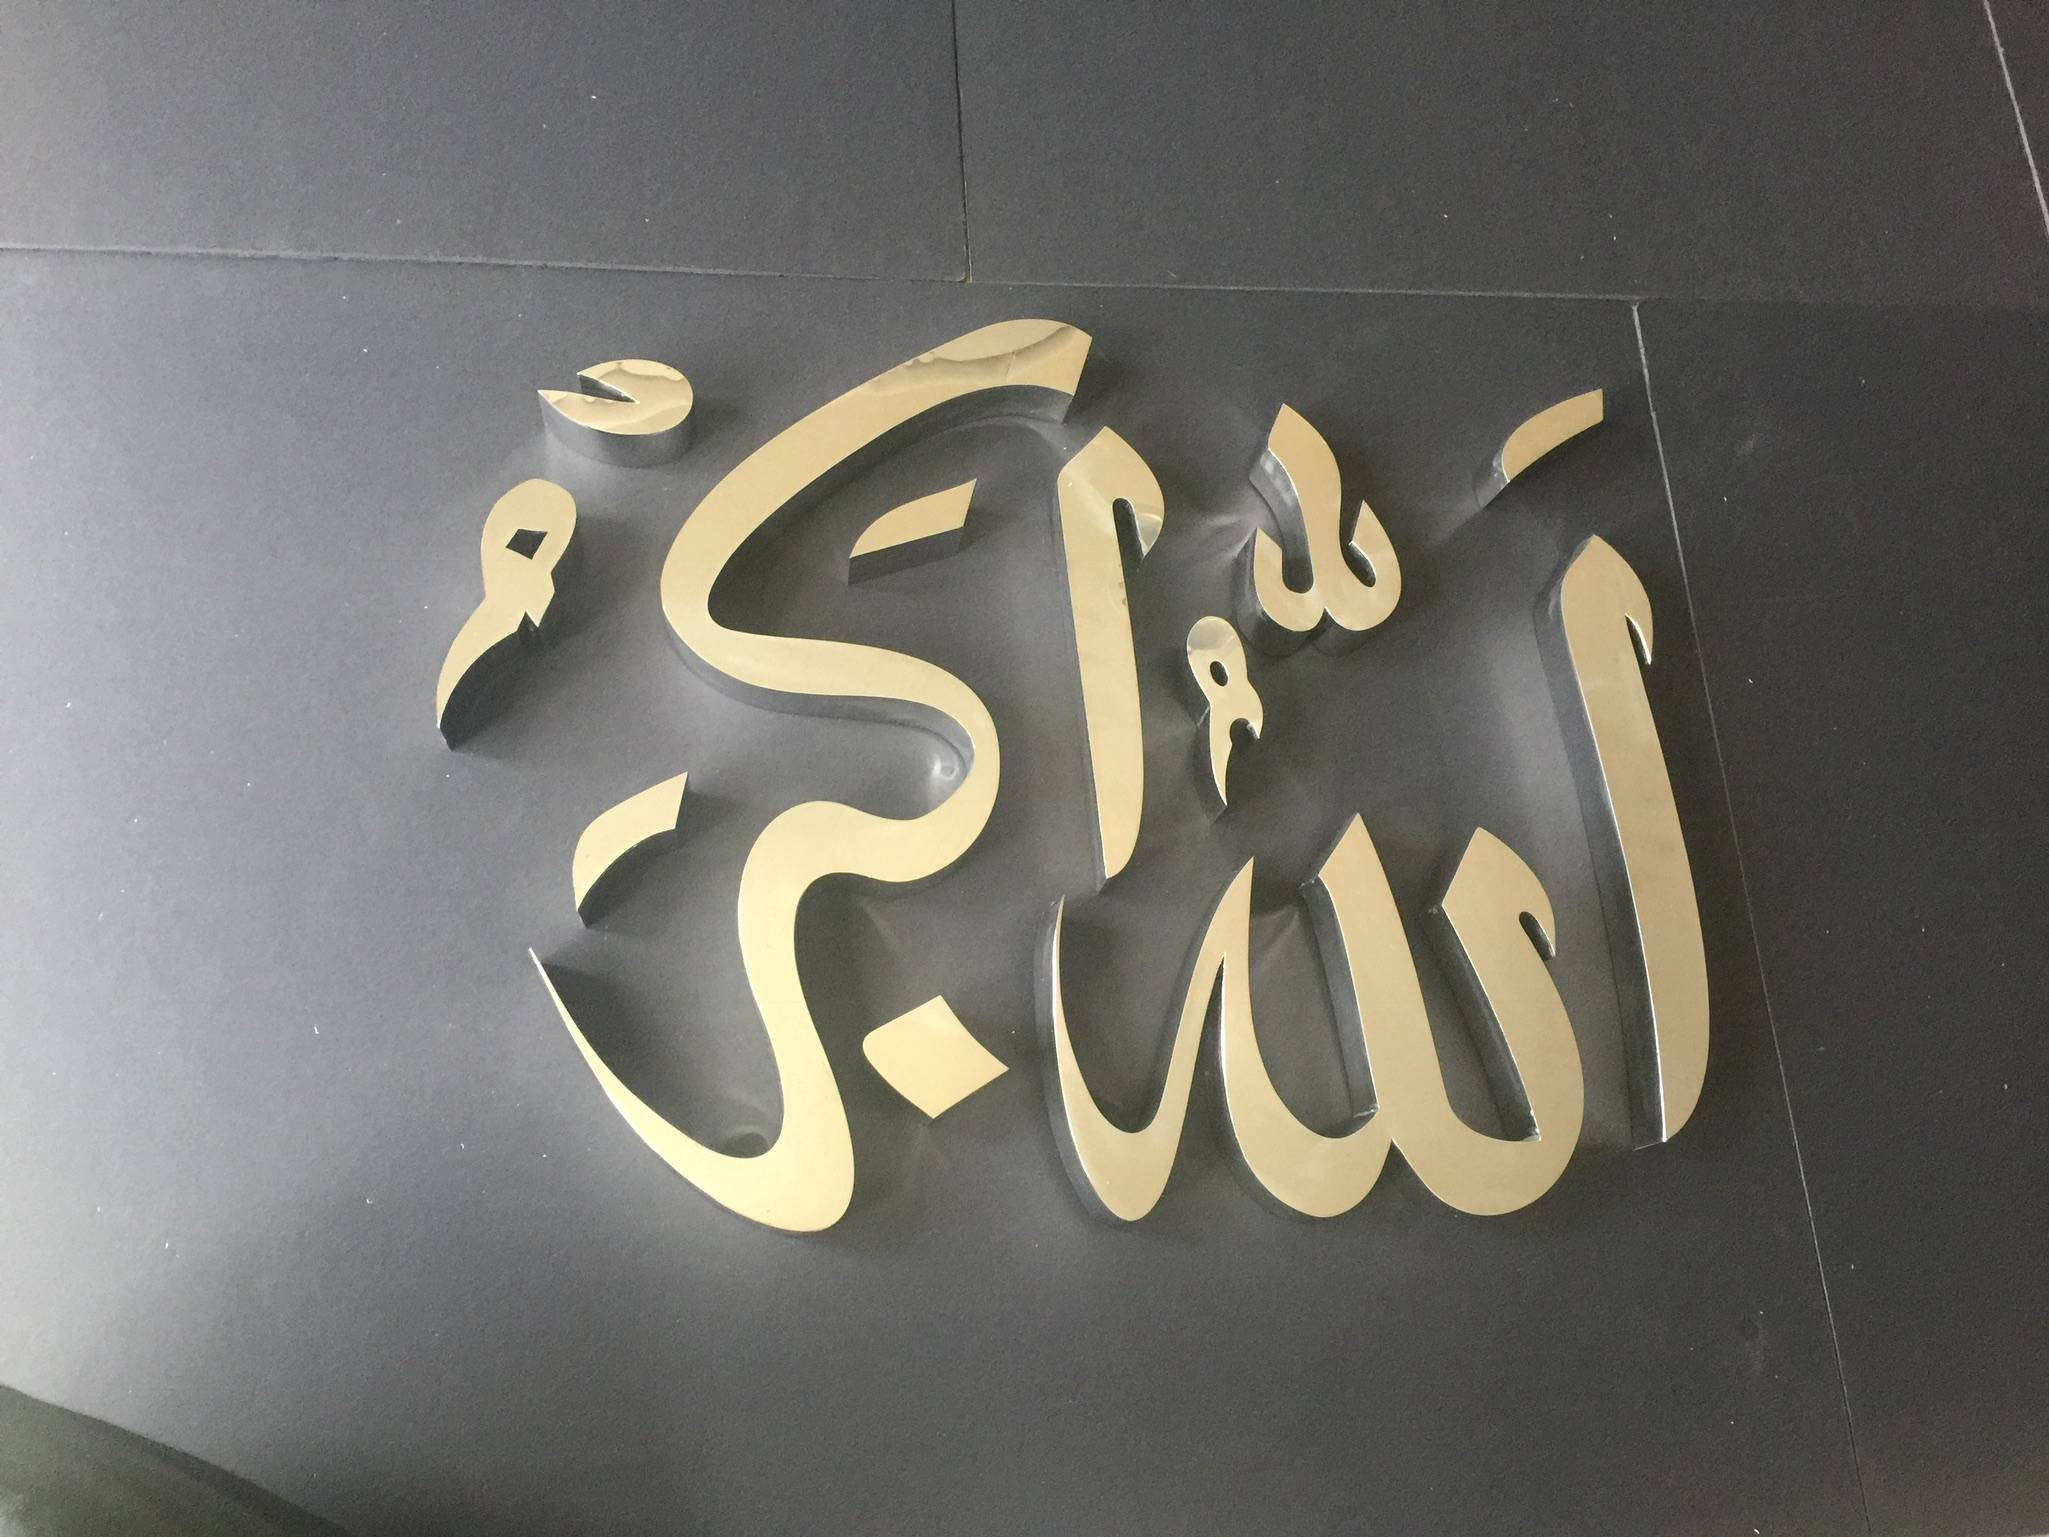 Ayatul Kursi Stainless Steel Modern Islamic Wall Art Arabic Regarding Most Recently Released Islamic Metal Wall Art (View 6 of 20)